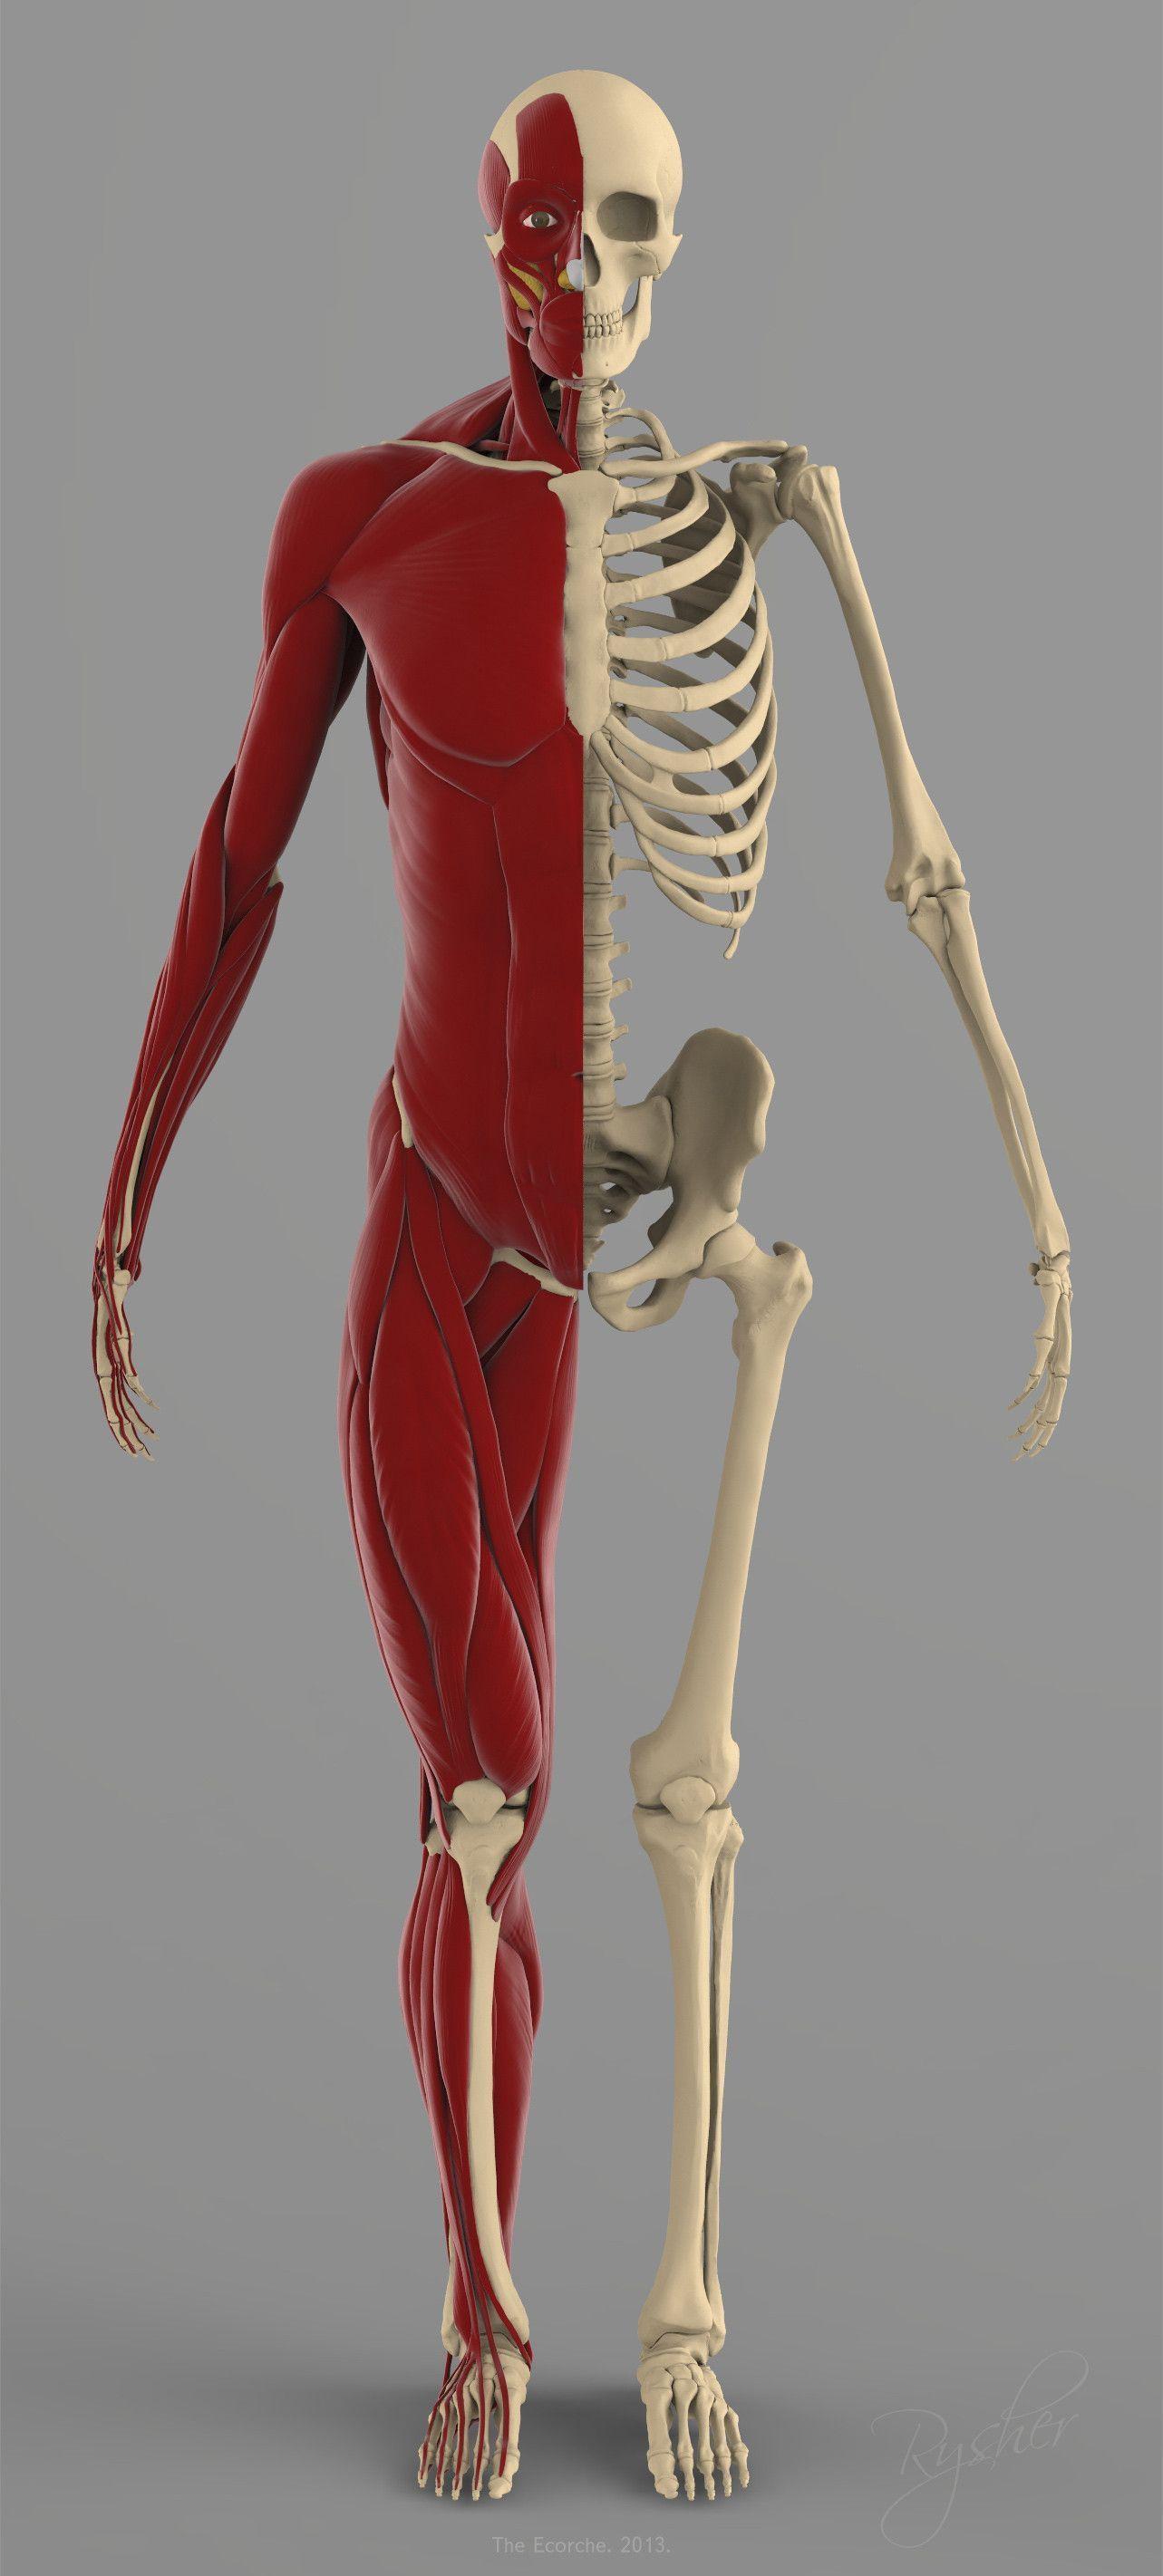 Precise Human Skeleton Muscles 3d Model Muscleanatomy Antomy